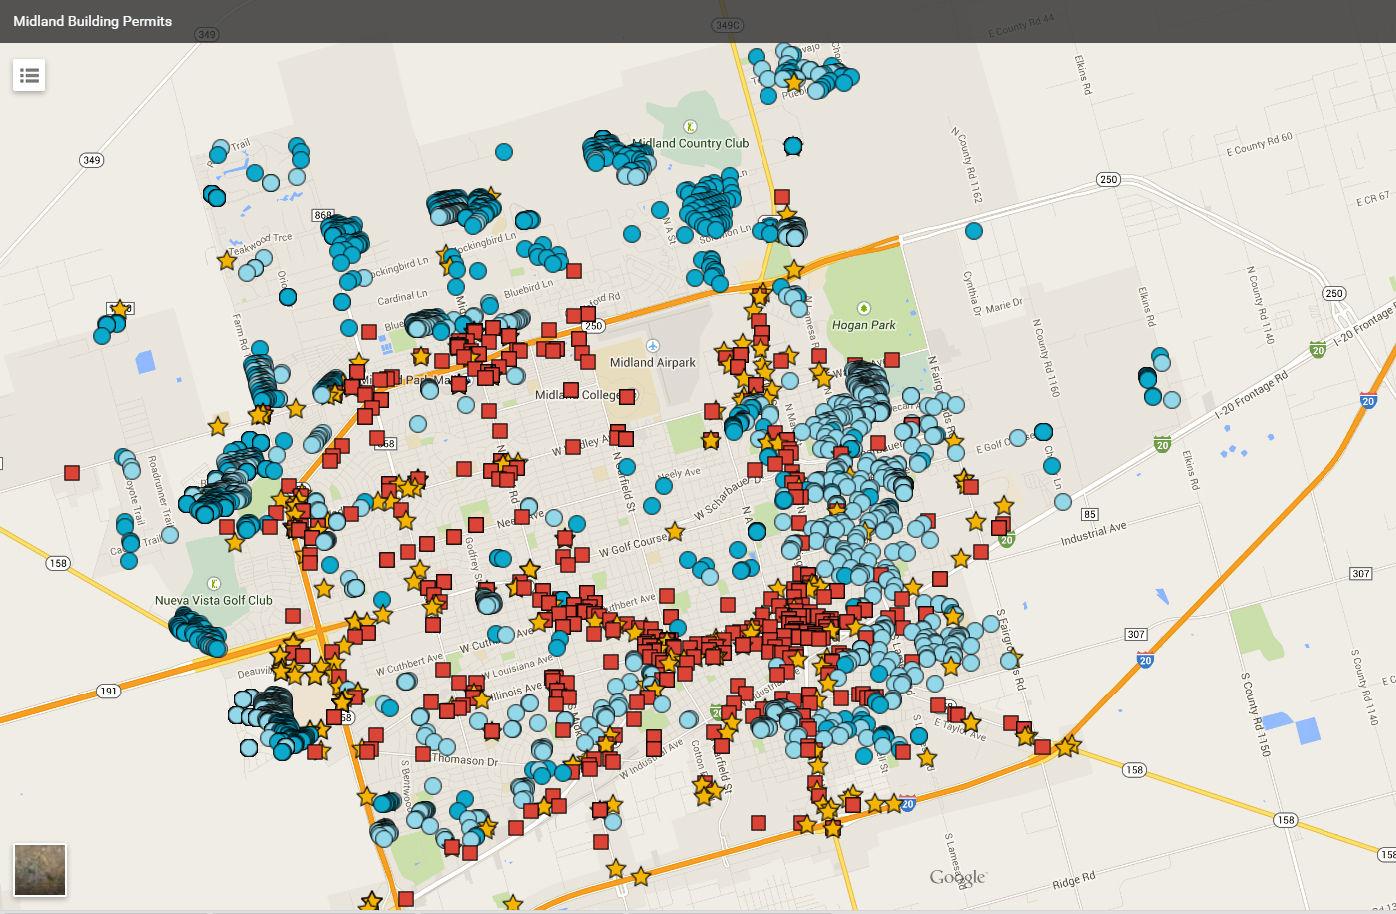 building permits data reveals midland development trends midland building permits data reveals midland development trends midland reporter telegram